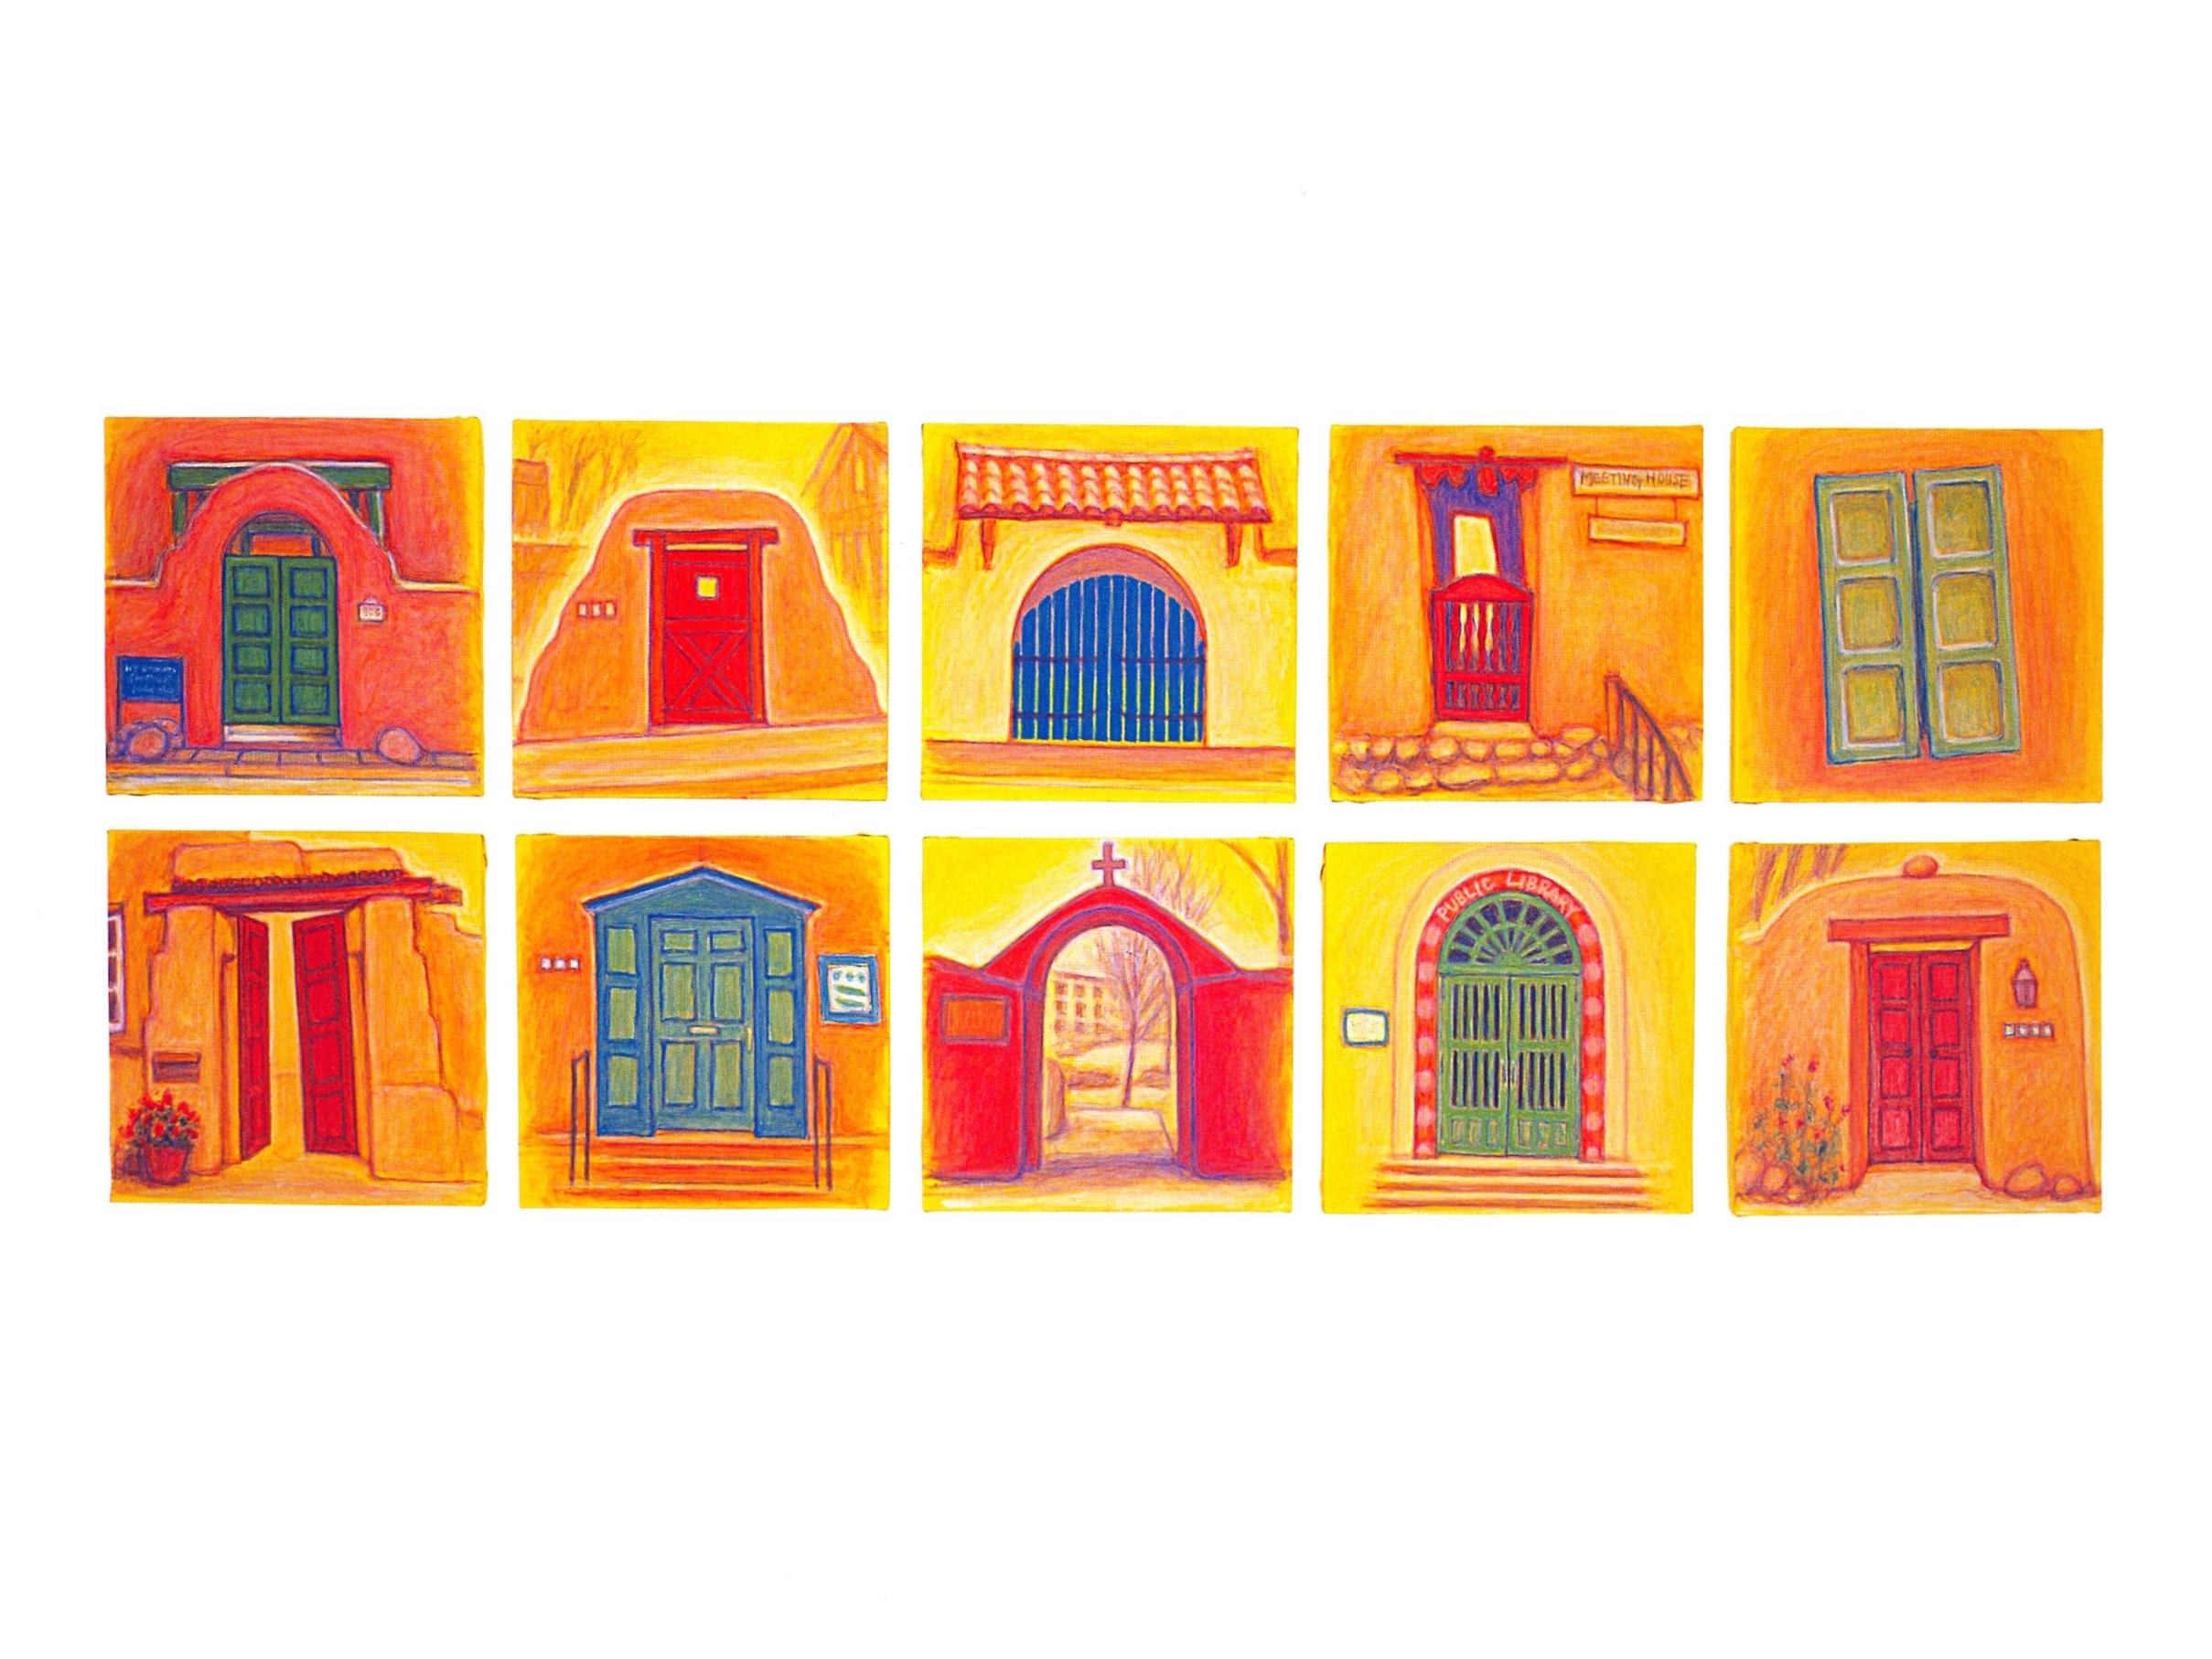 Door and Window, Santa Fe - 1   Oil on canvas, 27 1/2'' x 70 3/4'', 2004